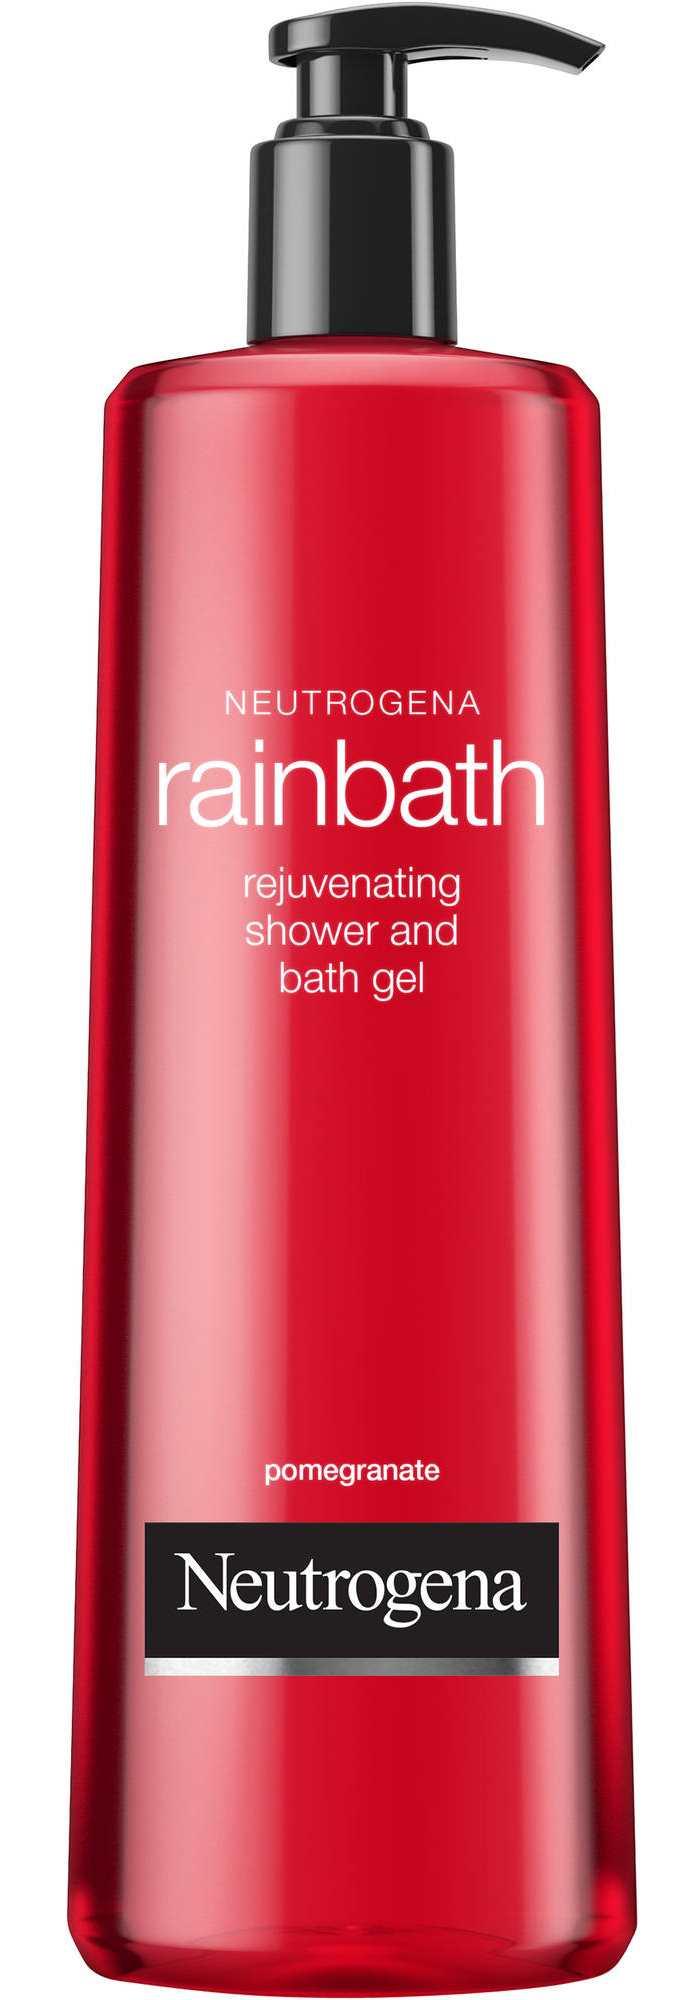 Neutrogena Rainbath Rejuvenating Shower Gel, Pomegranate